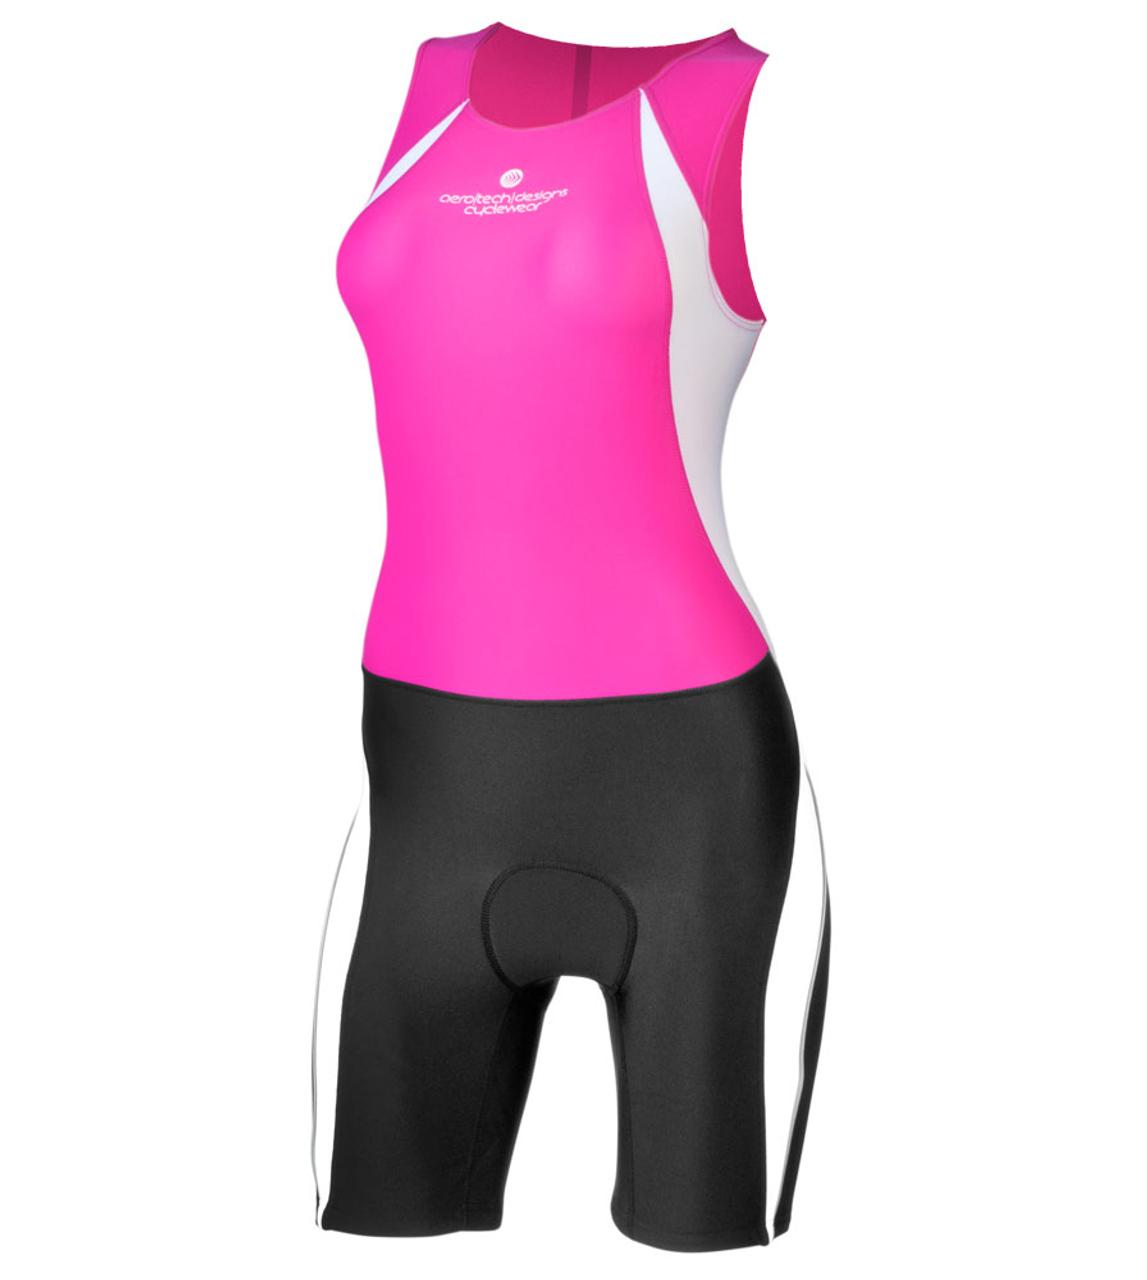 Aero Tech Women's Triathlon Competition Skin Suit - Two Color Options